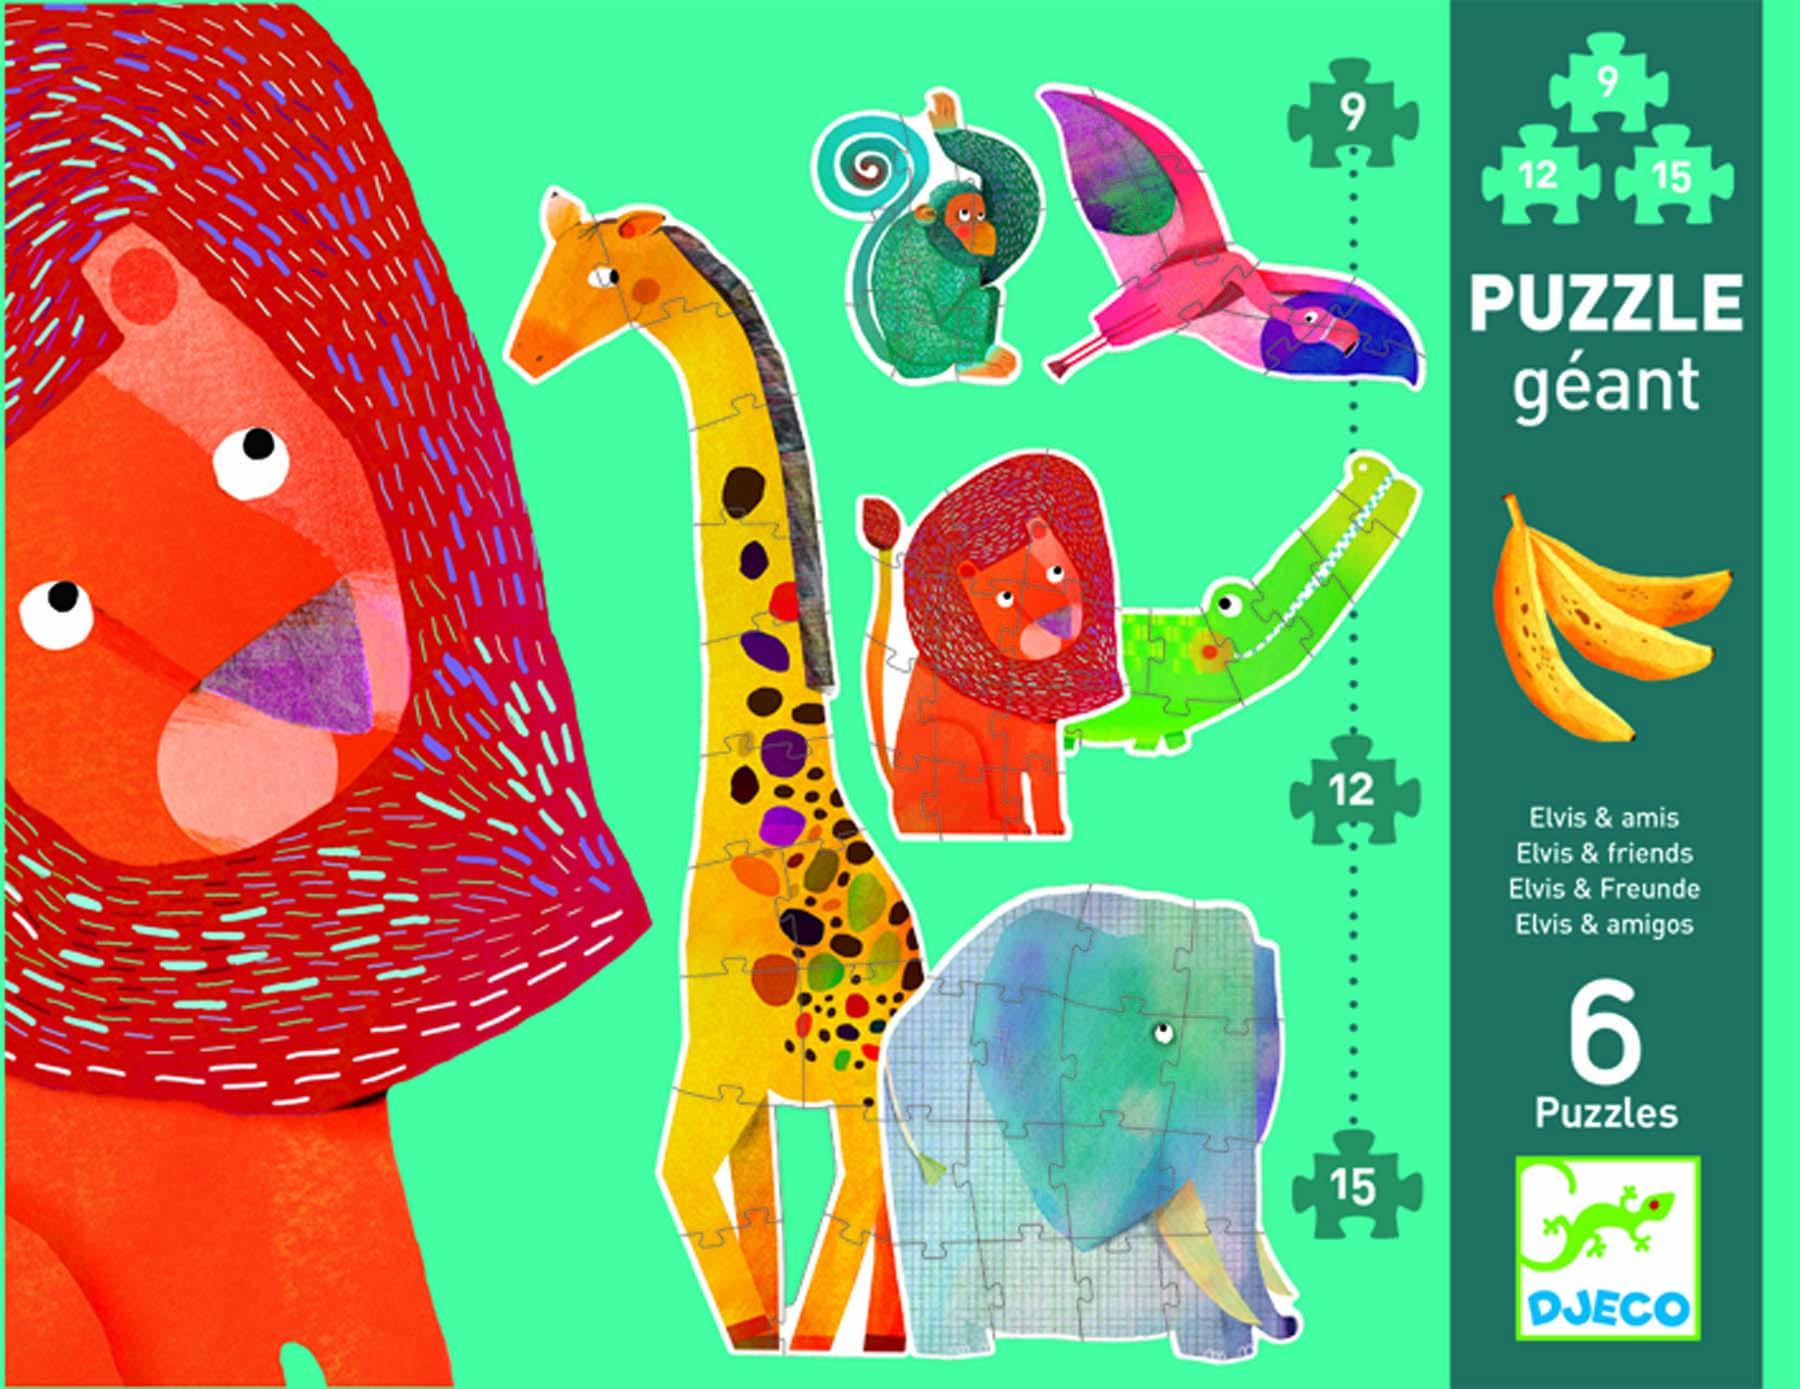 Puzzle gigant animale jungla djeco